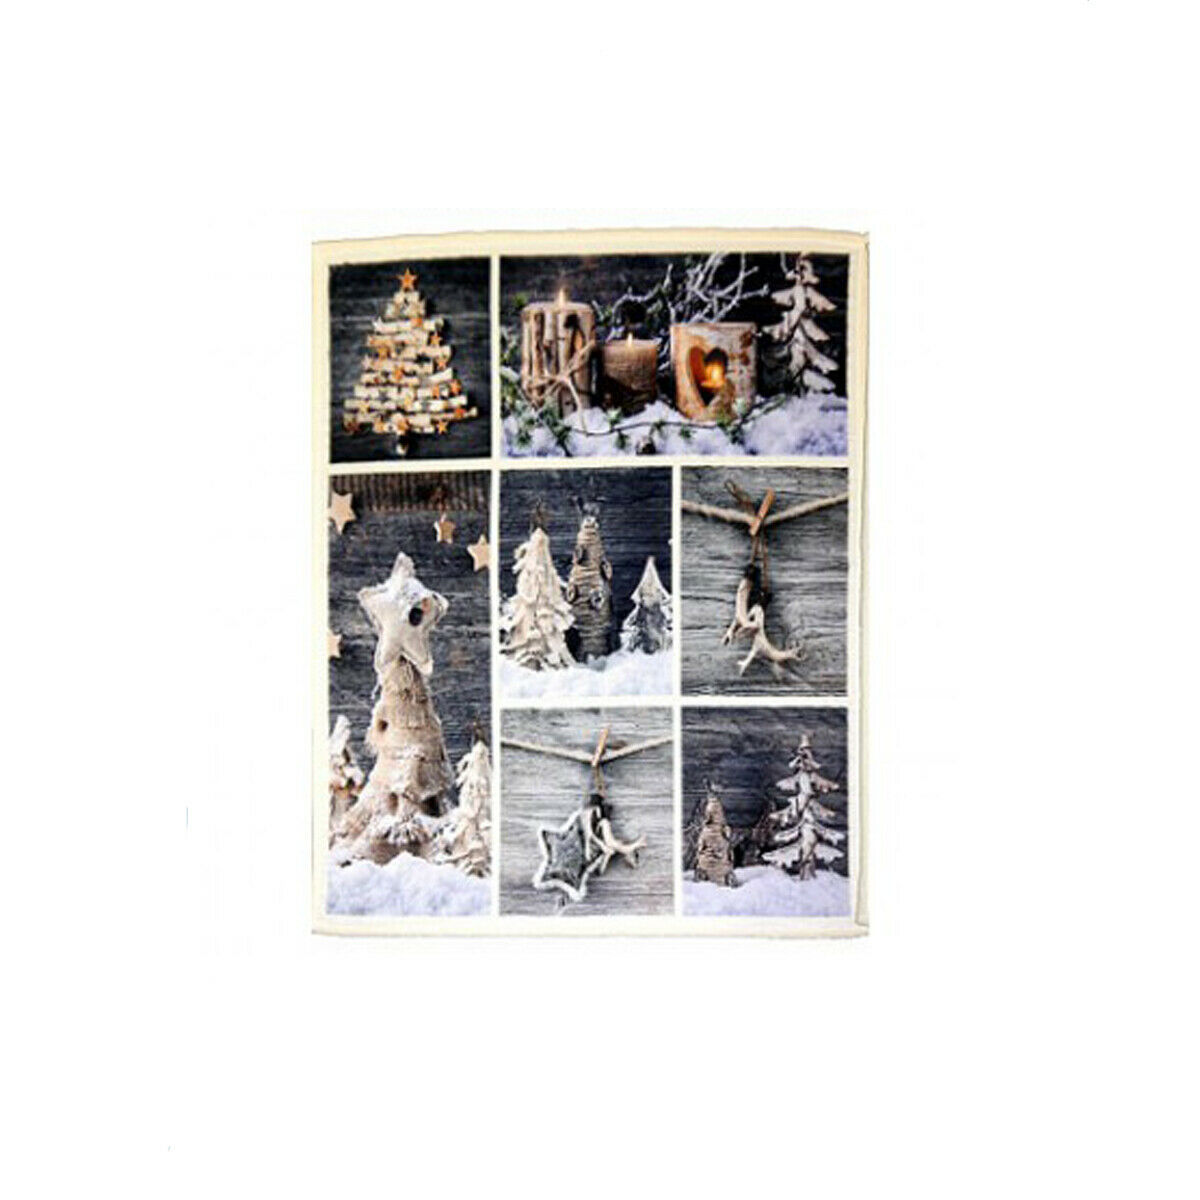 Wohndecke Winter 150x200 cm High Fleece Sherpa Digitaldruck Kuscheldecke Decke